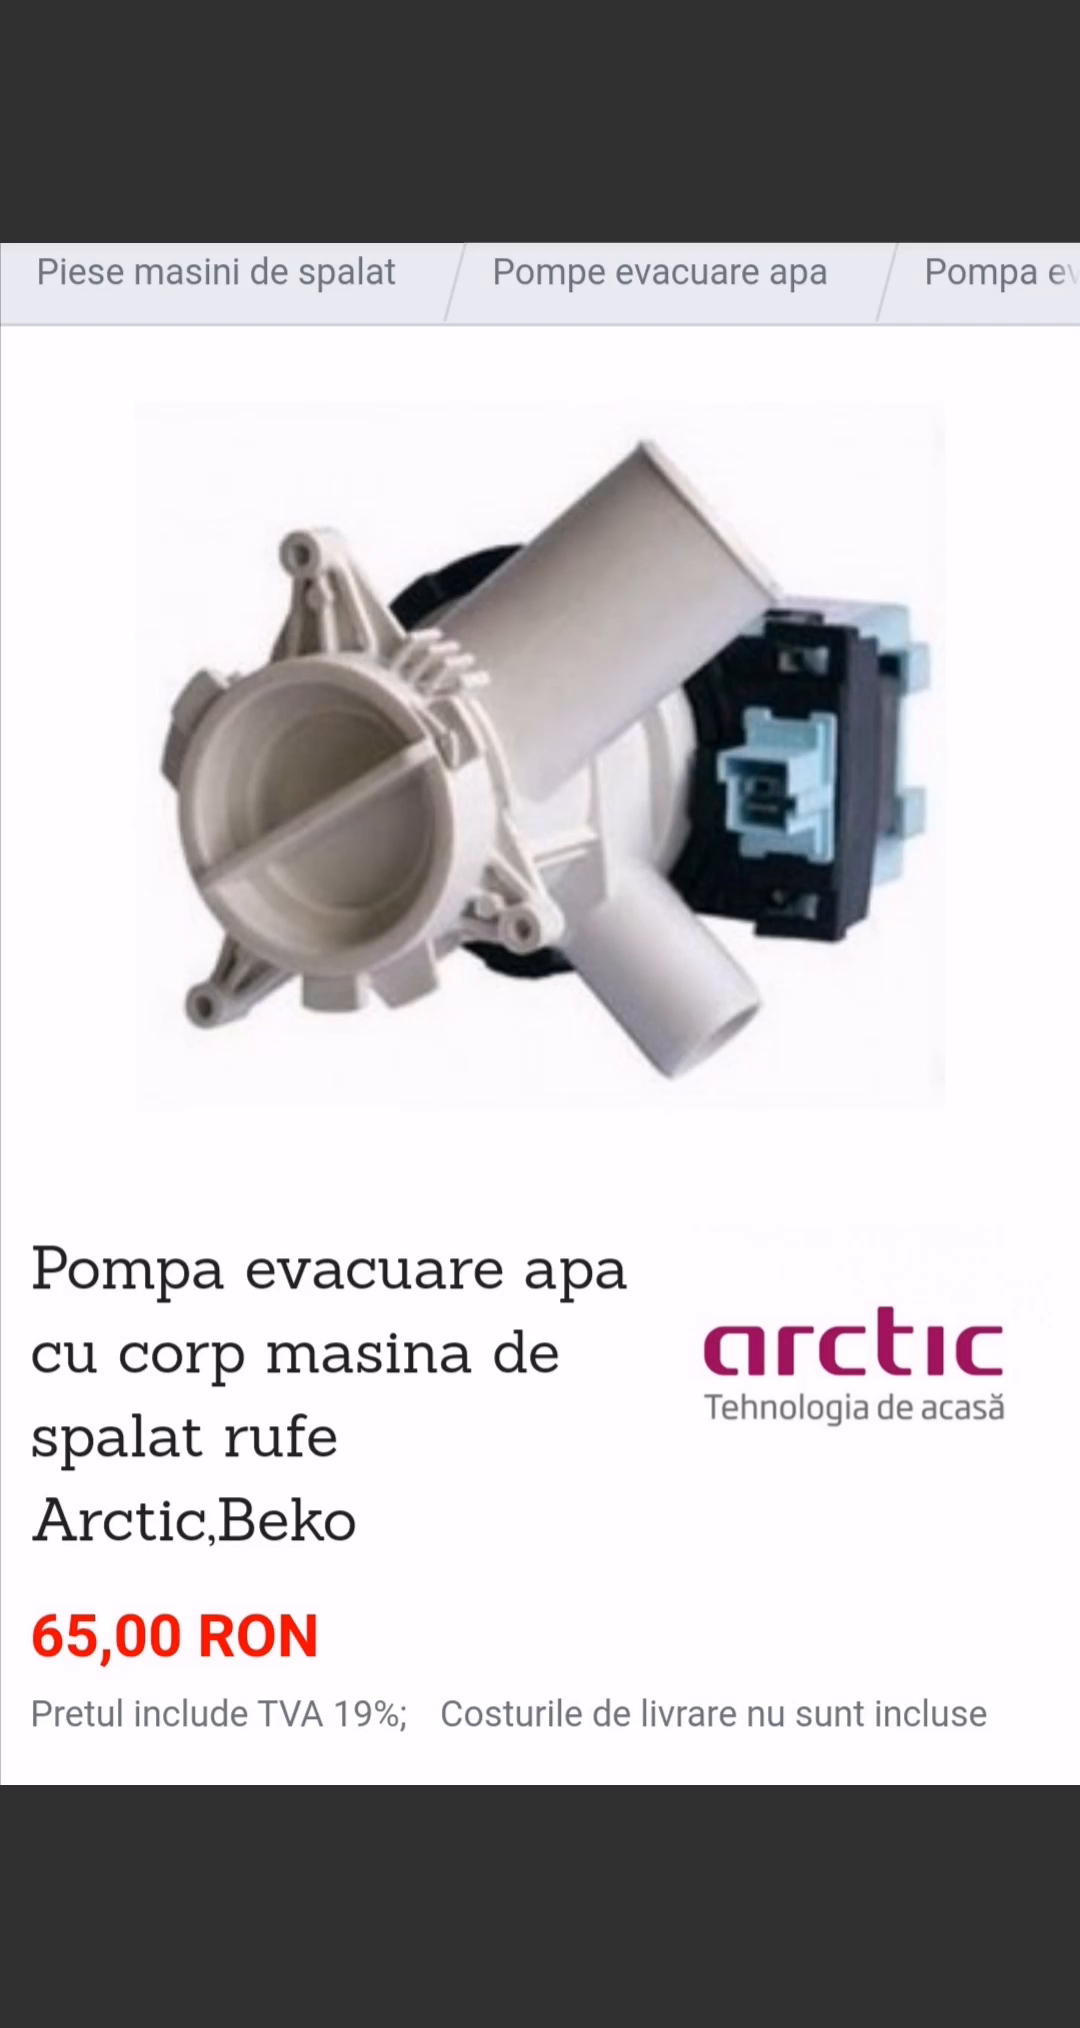 eviastore.ro, piese pentru instalatii frigorifice